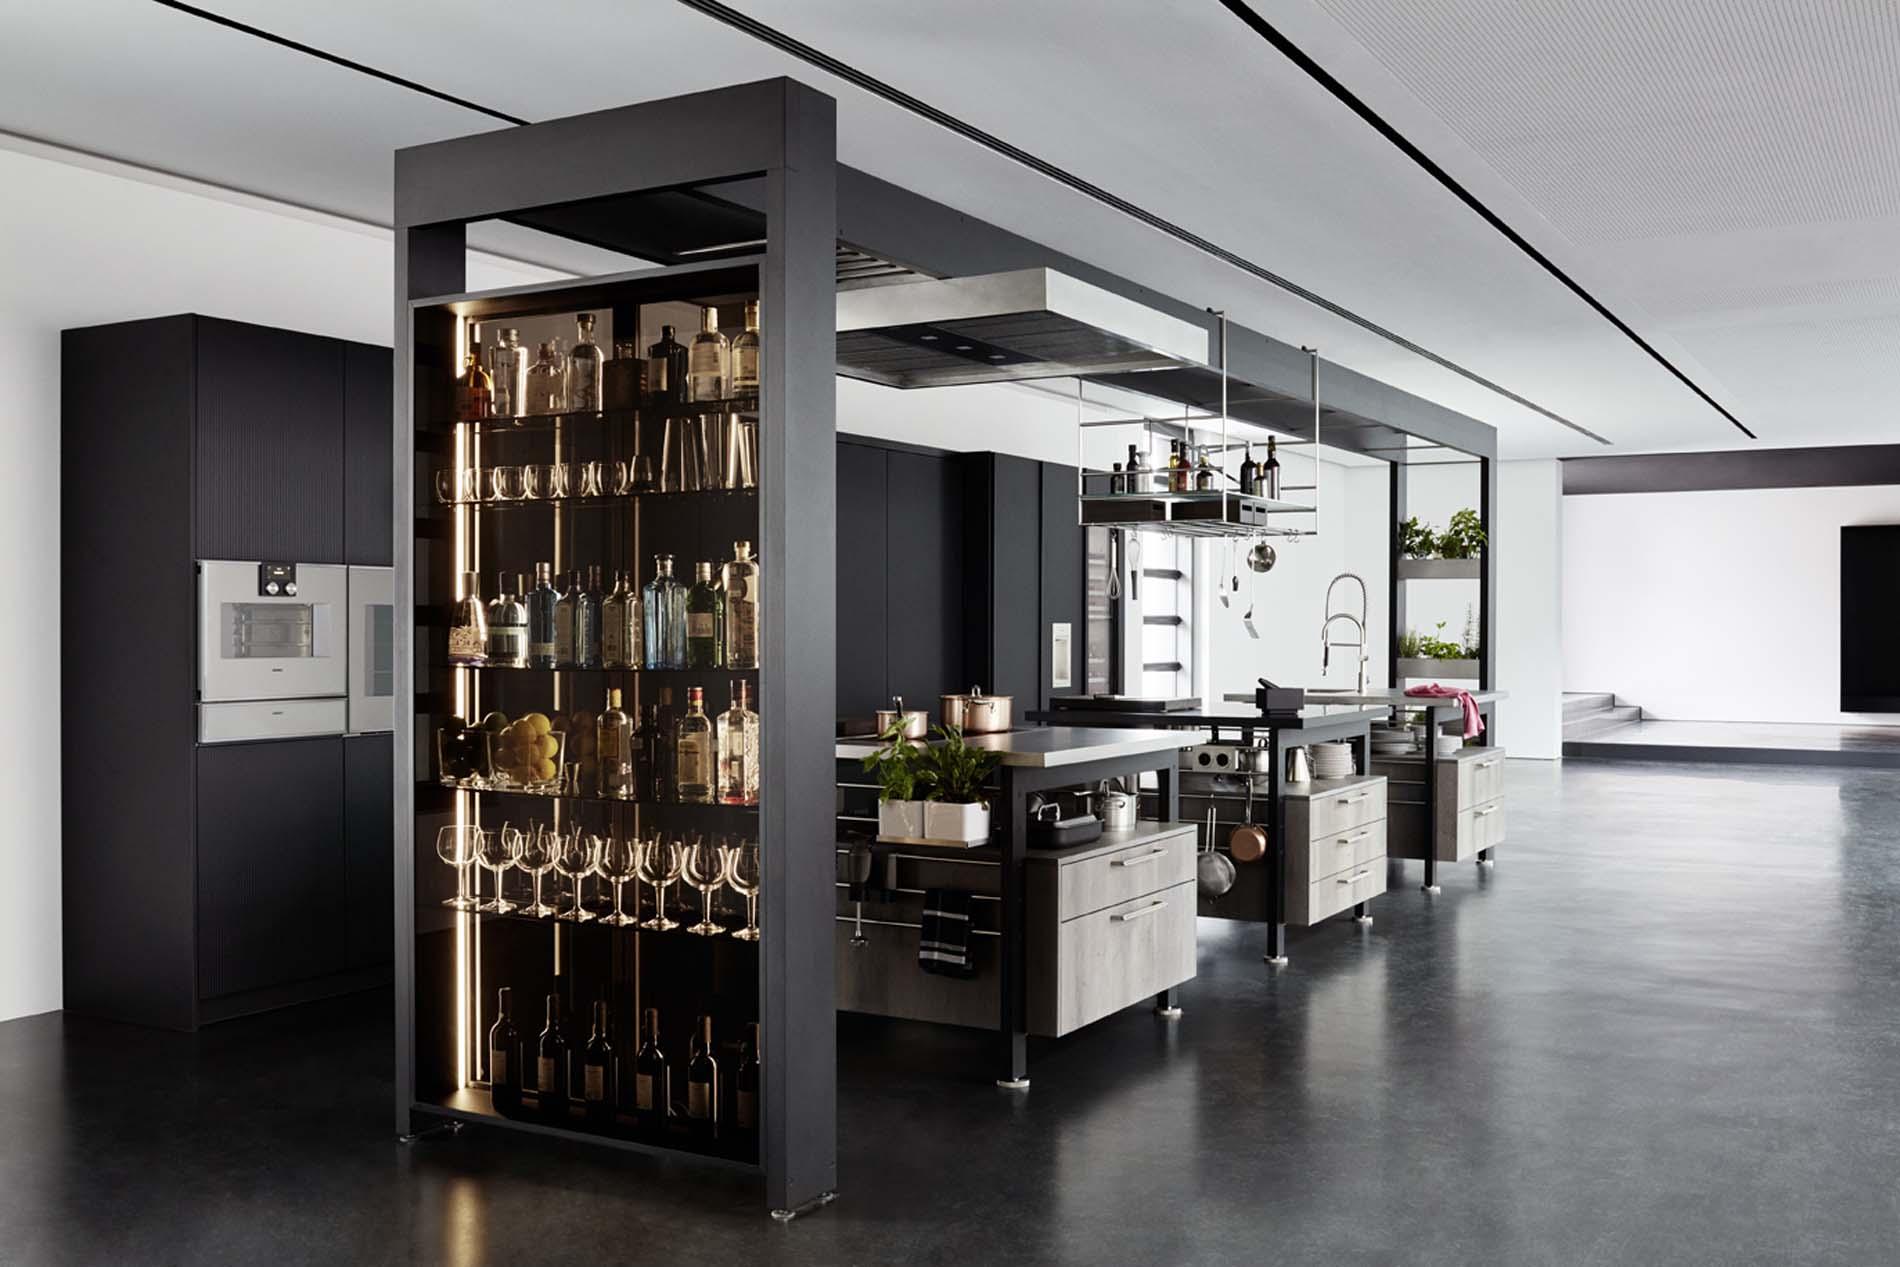 Eggersmann Keukens Dealers : Industriële keukens nieuwe keuken kopen aswa keukens